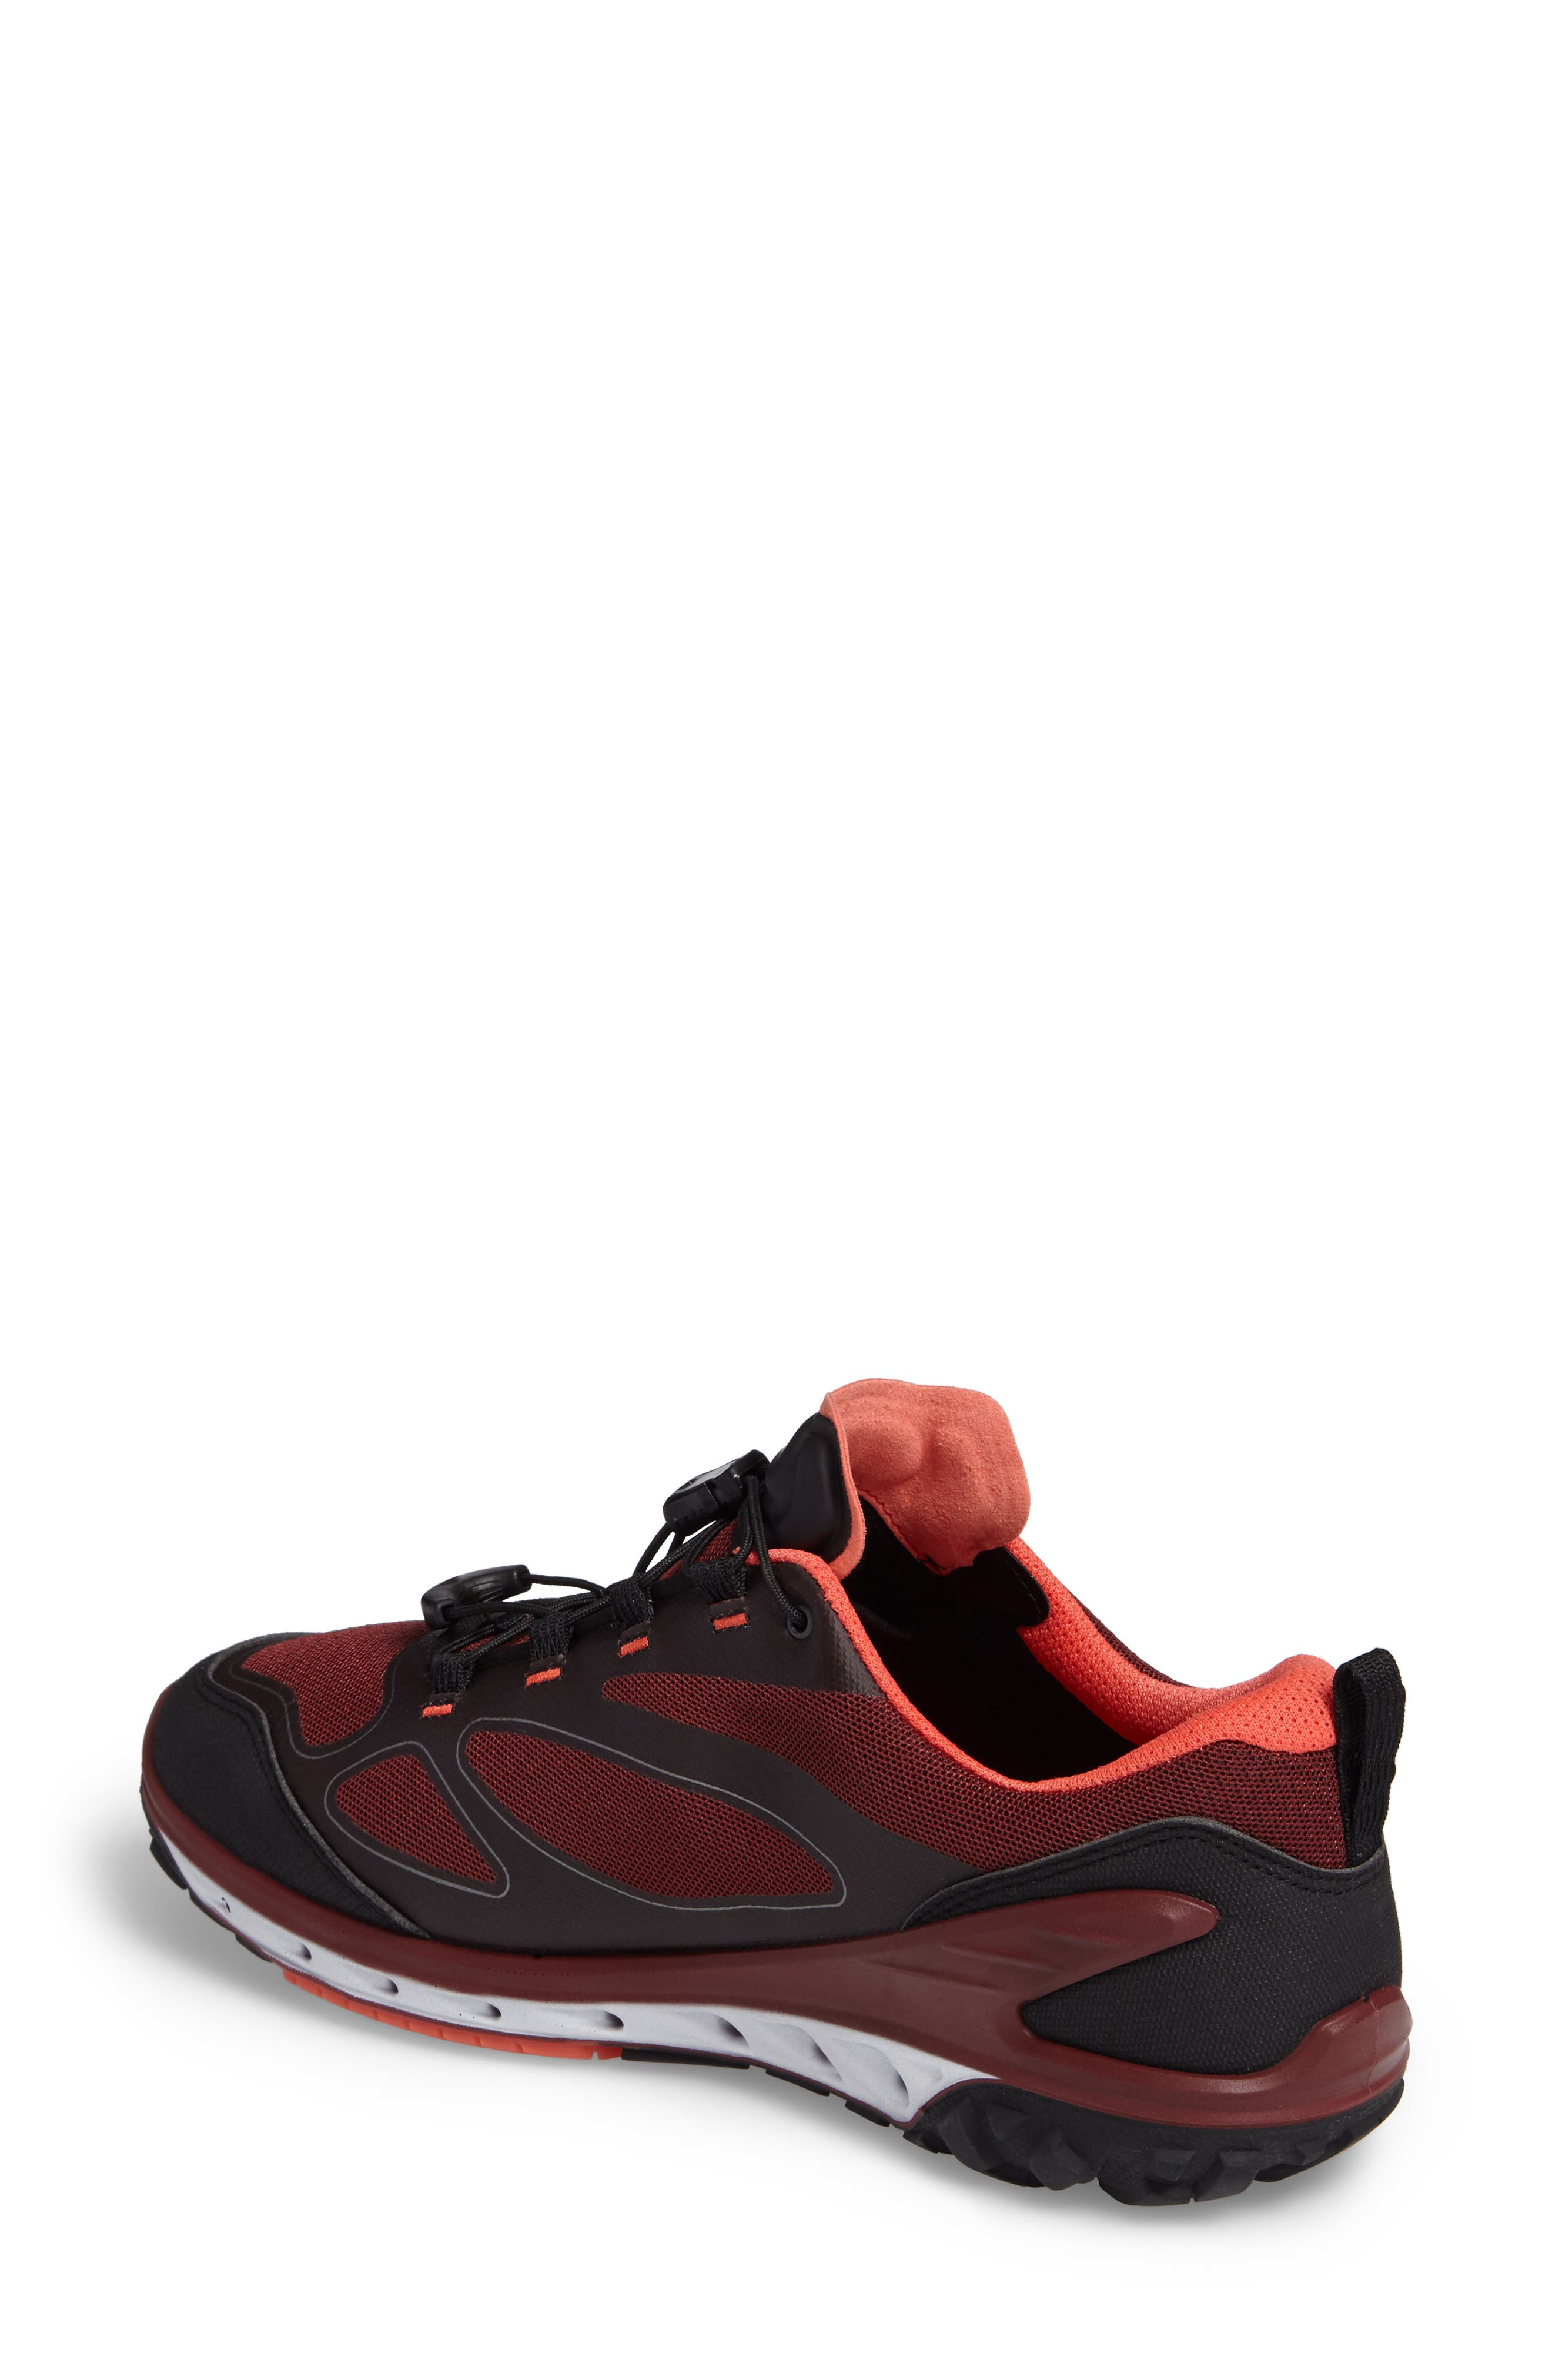 BIOM Venture GTX Sneaker,                             Alternate thumbnail 2, color,                             Black/ Coral Blush Fabric